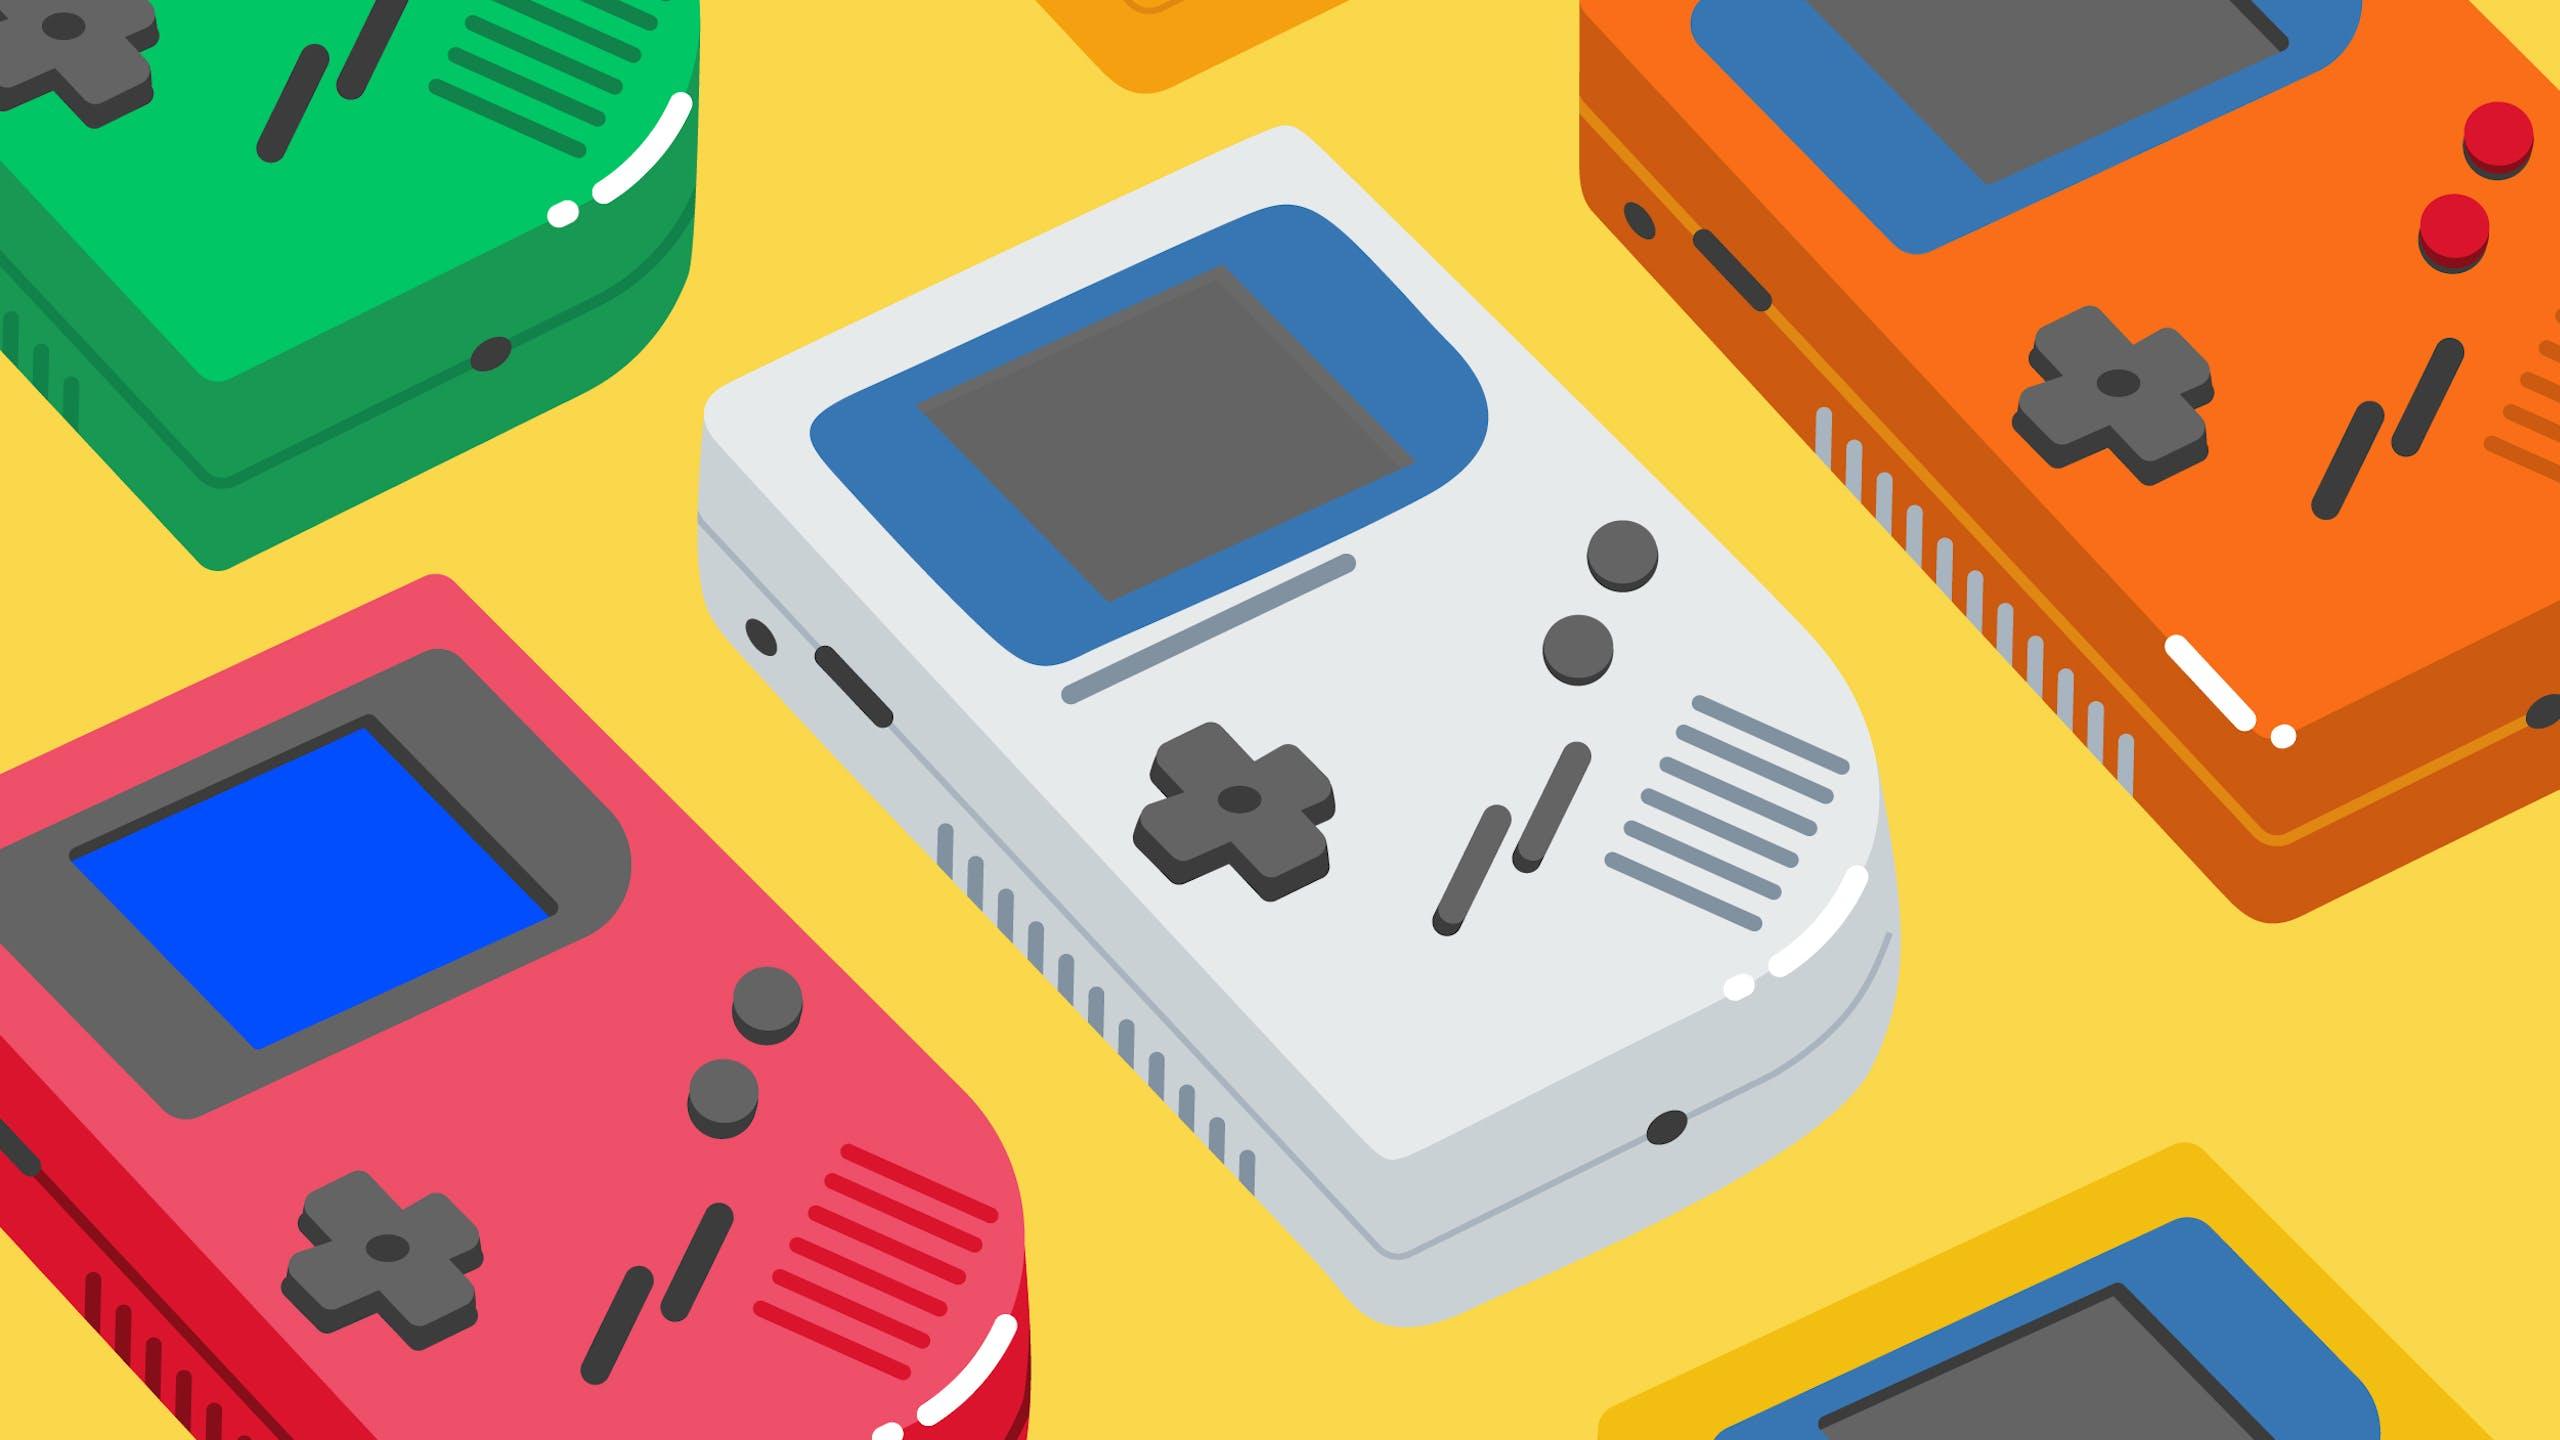 illustration Game Boy Séverine Assous